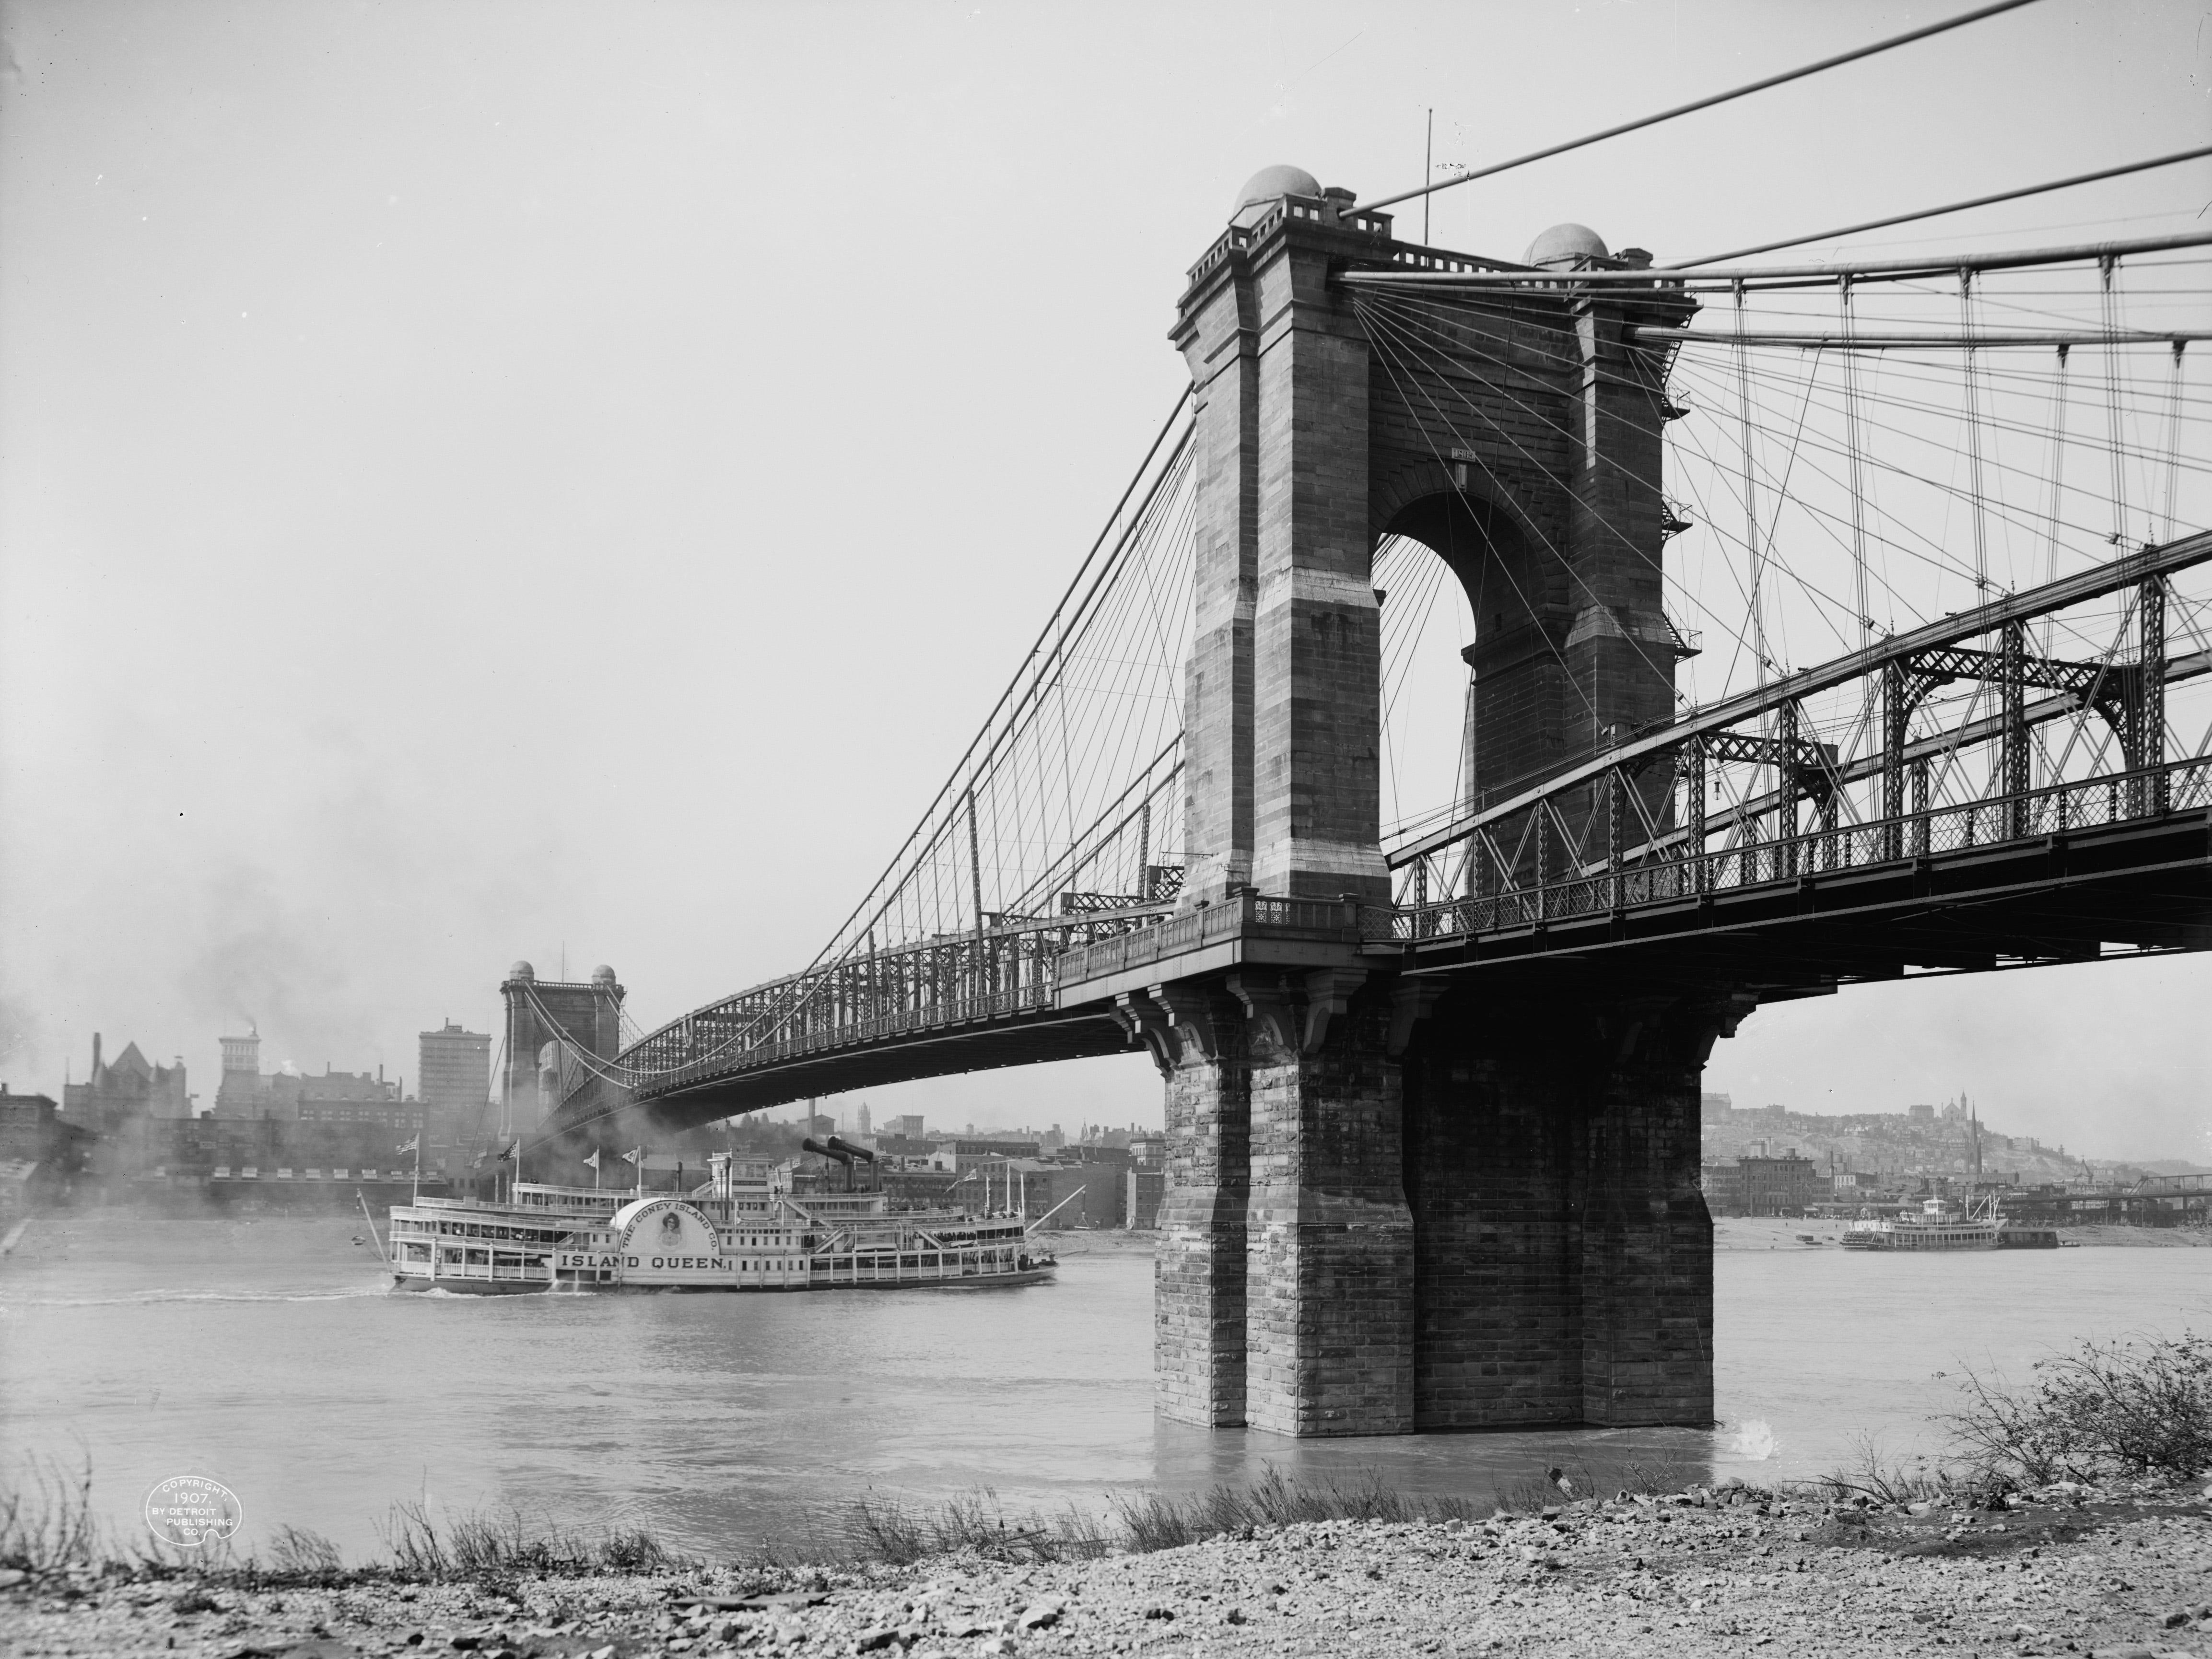 The Island Queen (first version) passes under the Roebling Suspension Bridge, carrying Coney Island passengers. Coney Island, Cincinnati Detroit Publishing Company/The Library of Congress Coney Island, Cincinnati Circa 1910